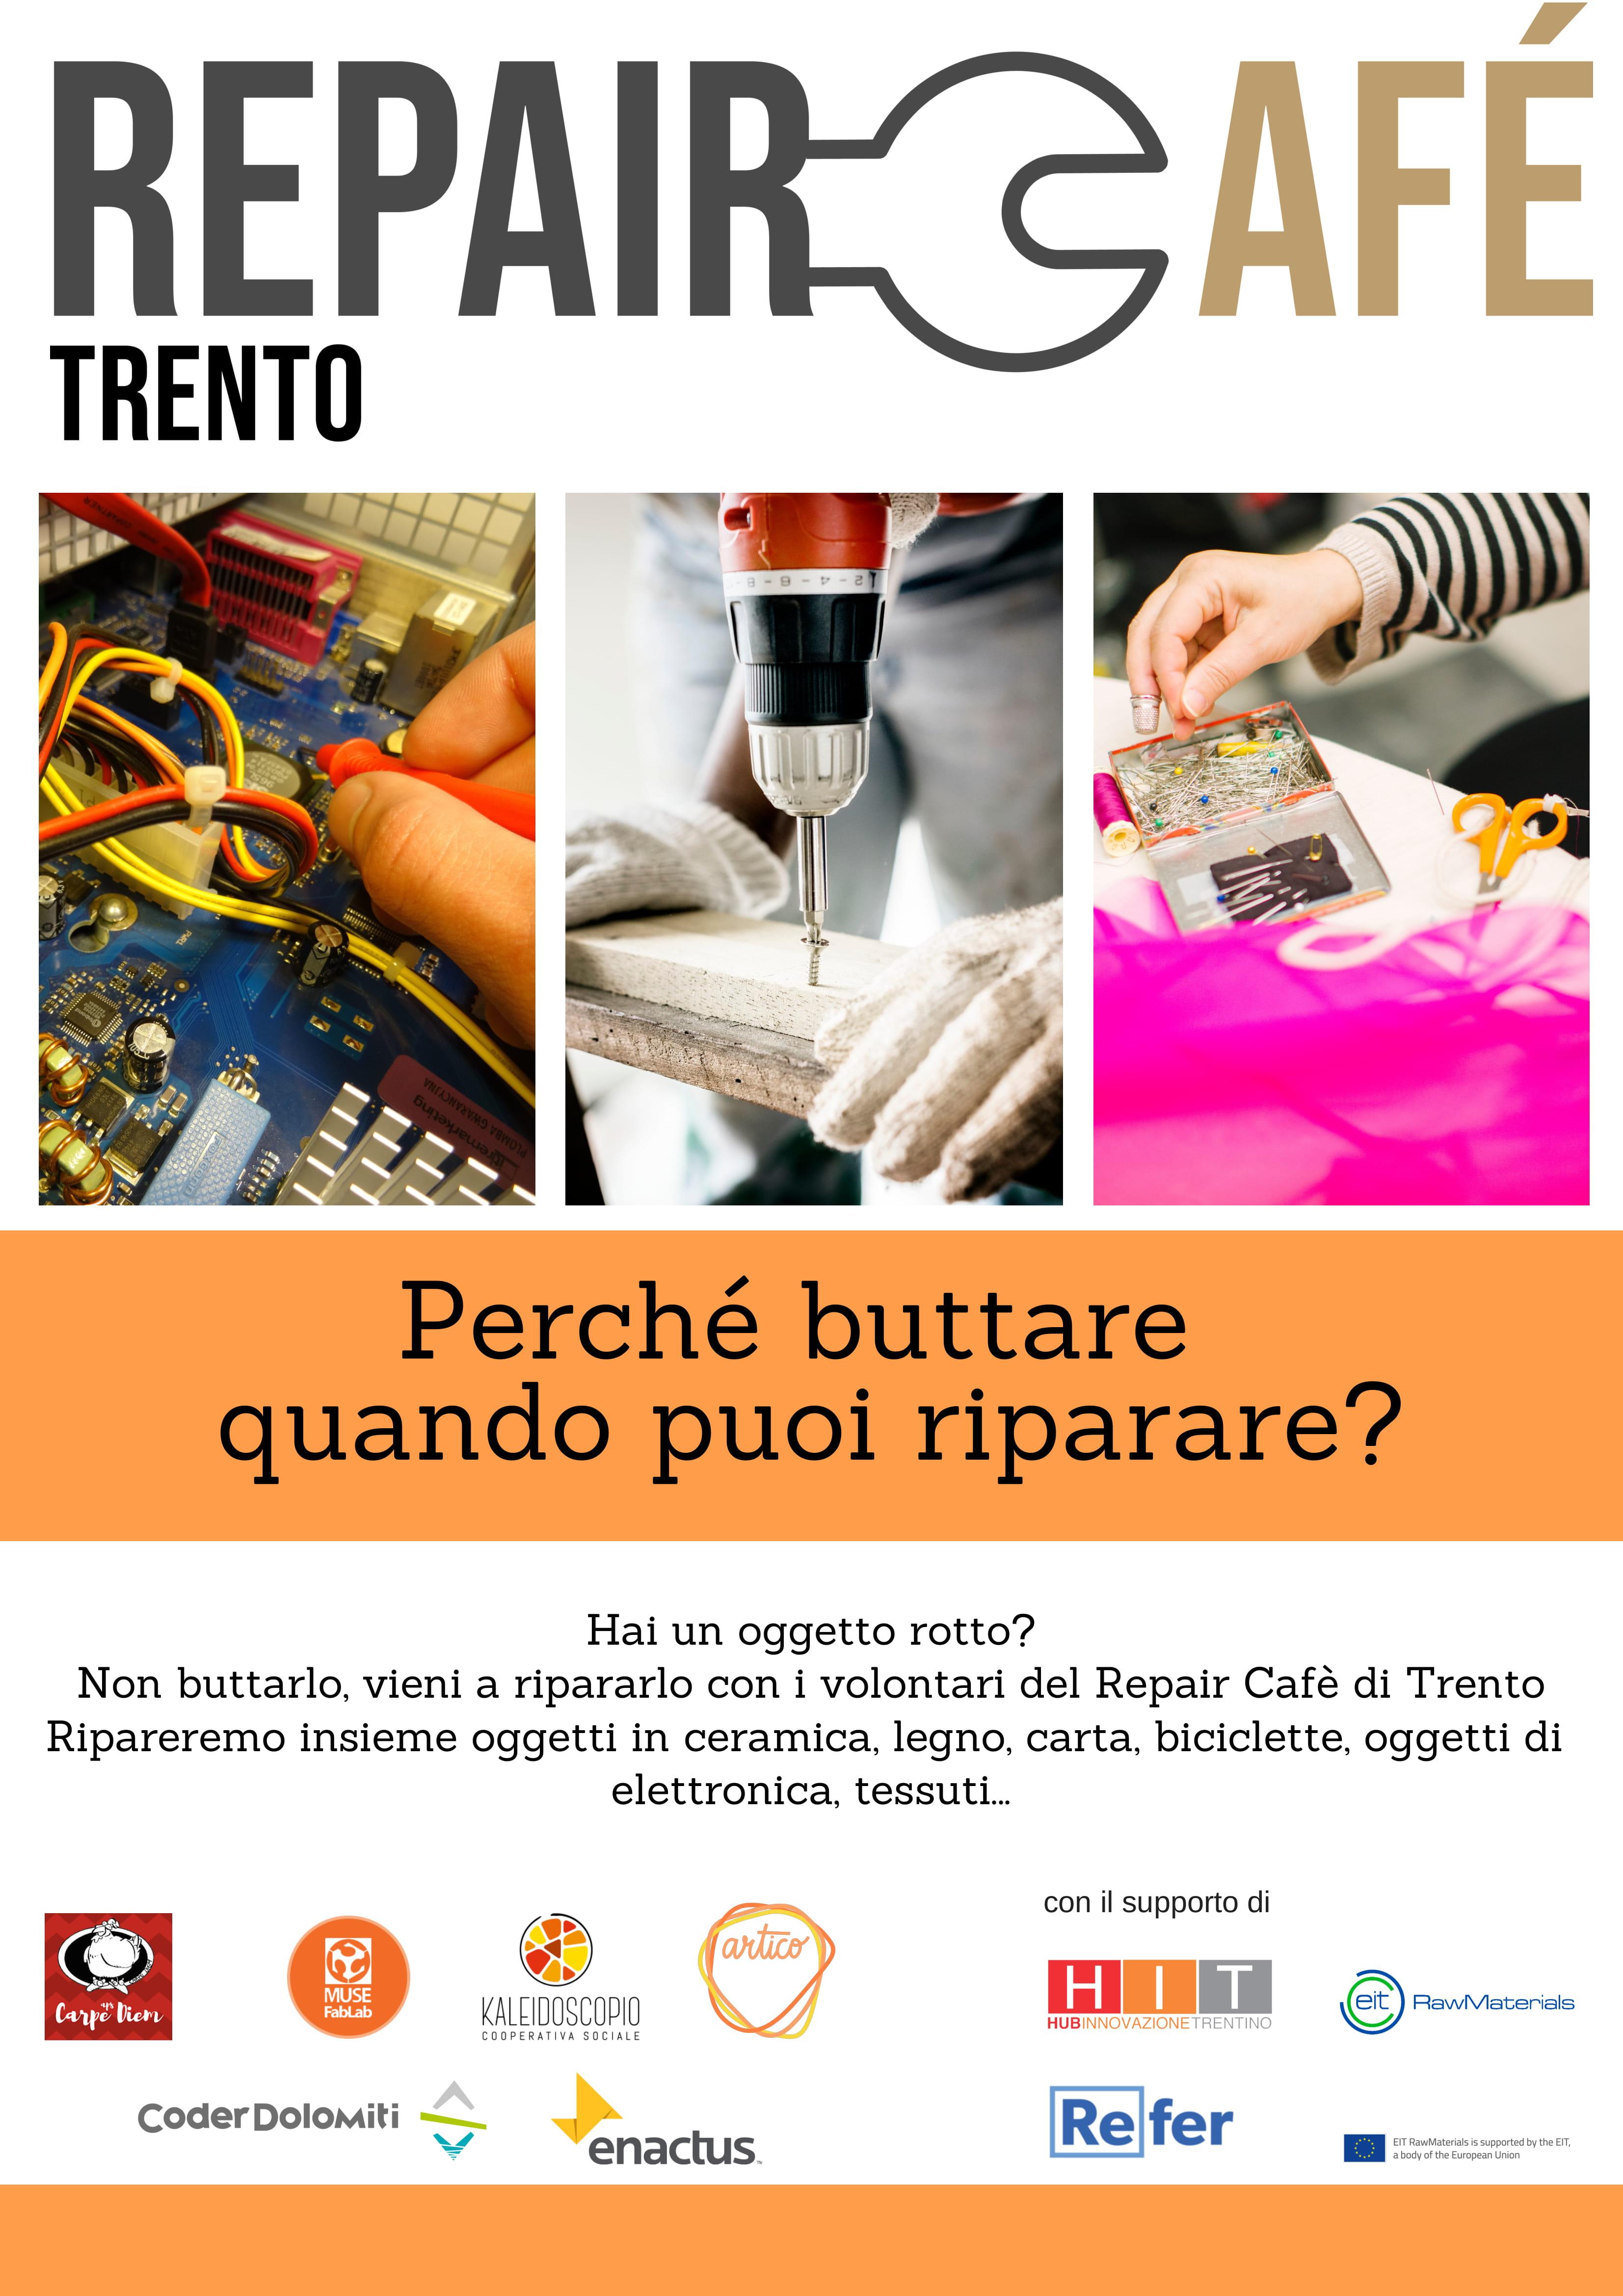 I Repair Café ritornano in Trentino